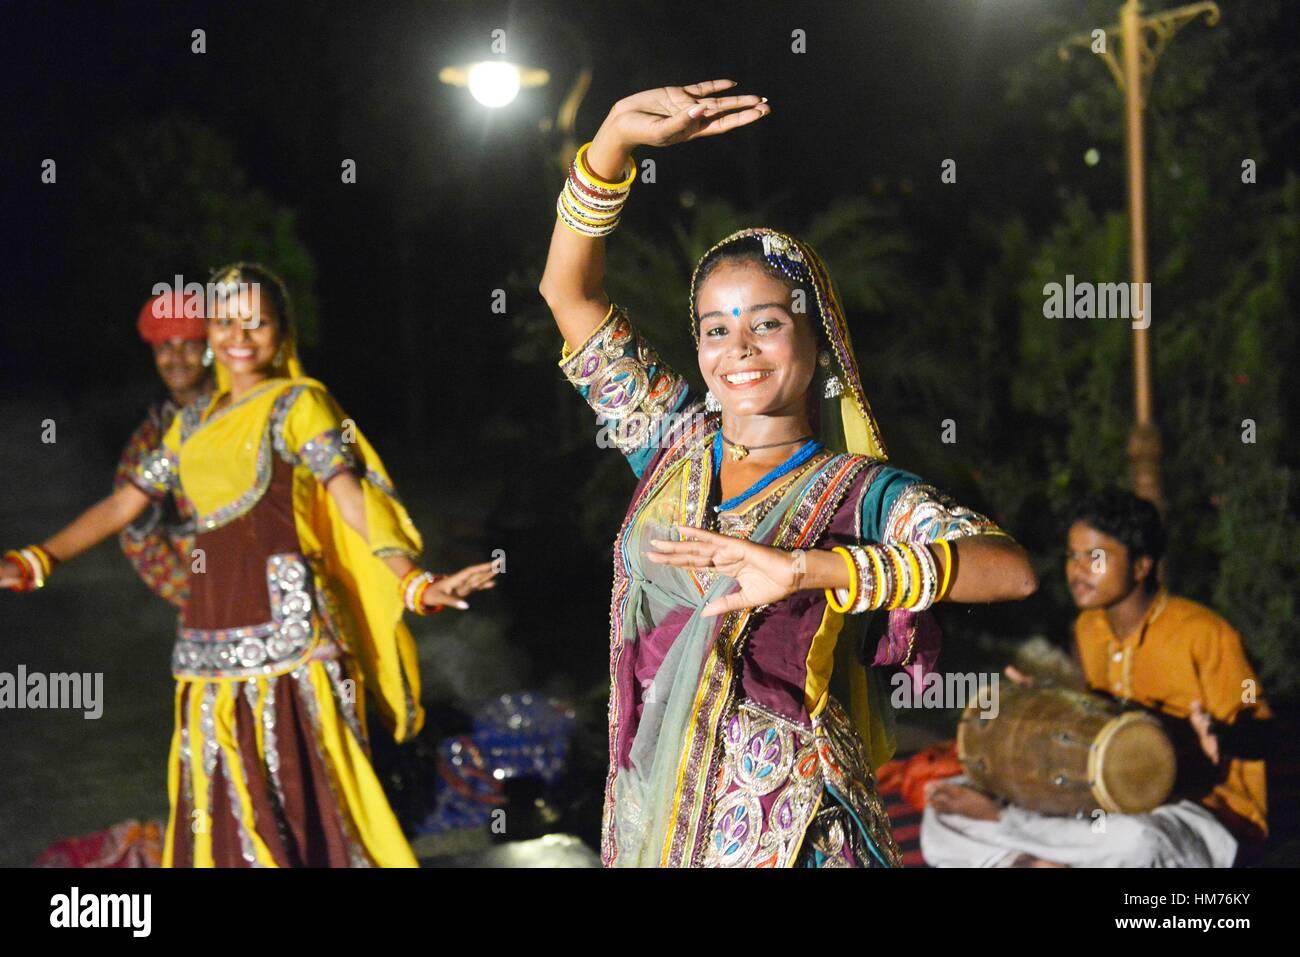 Rajasthani traditional dance in Jaipur, Rajasthan, India. Stock Photo